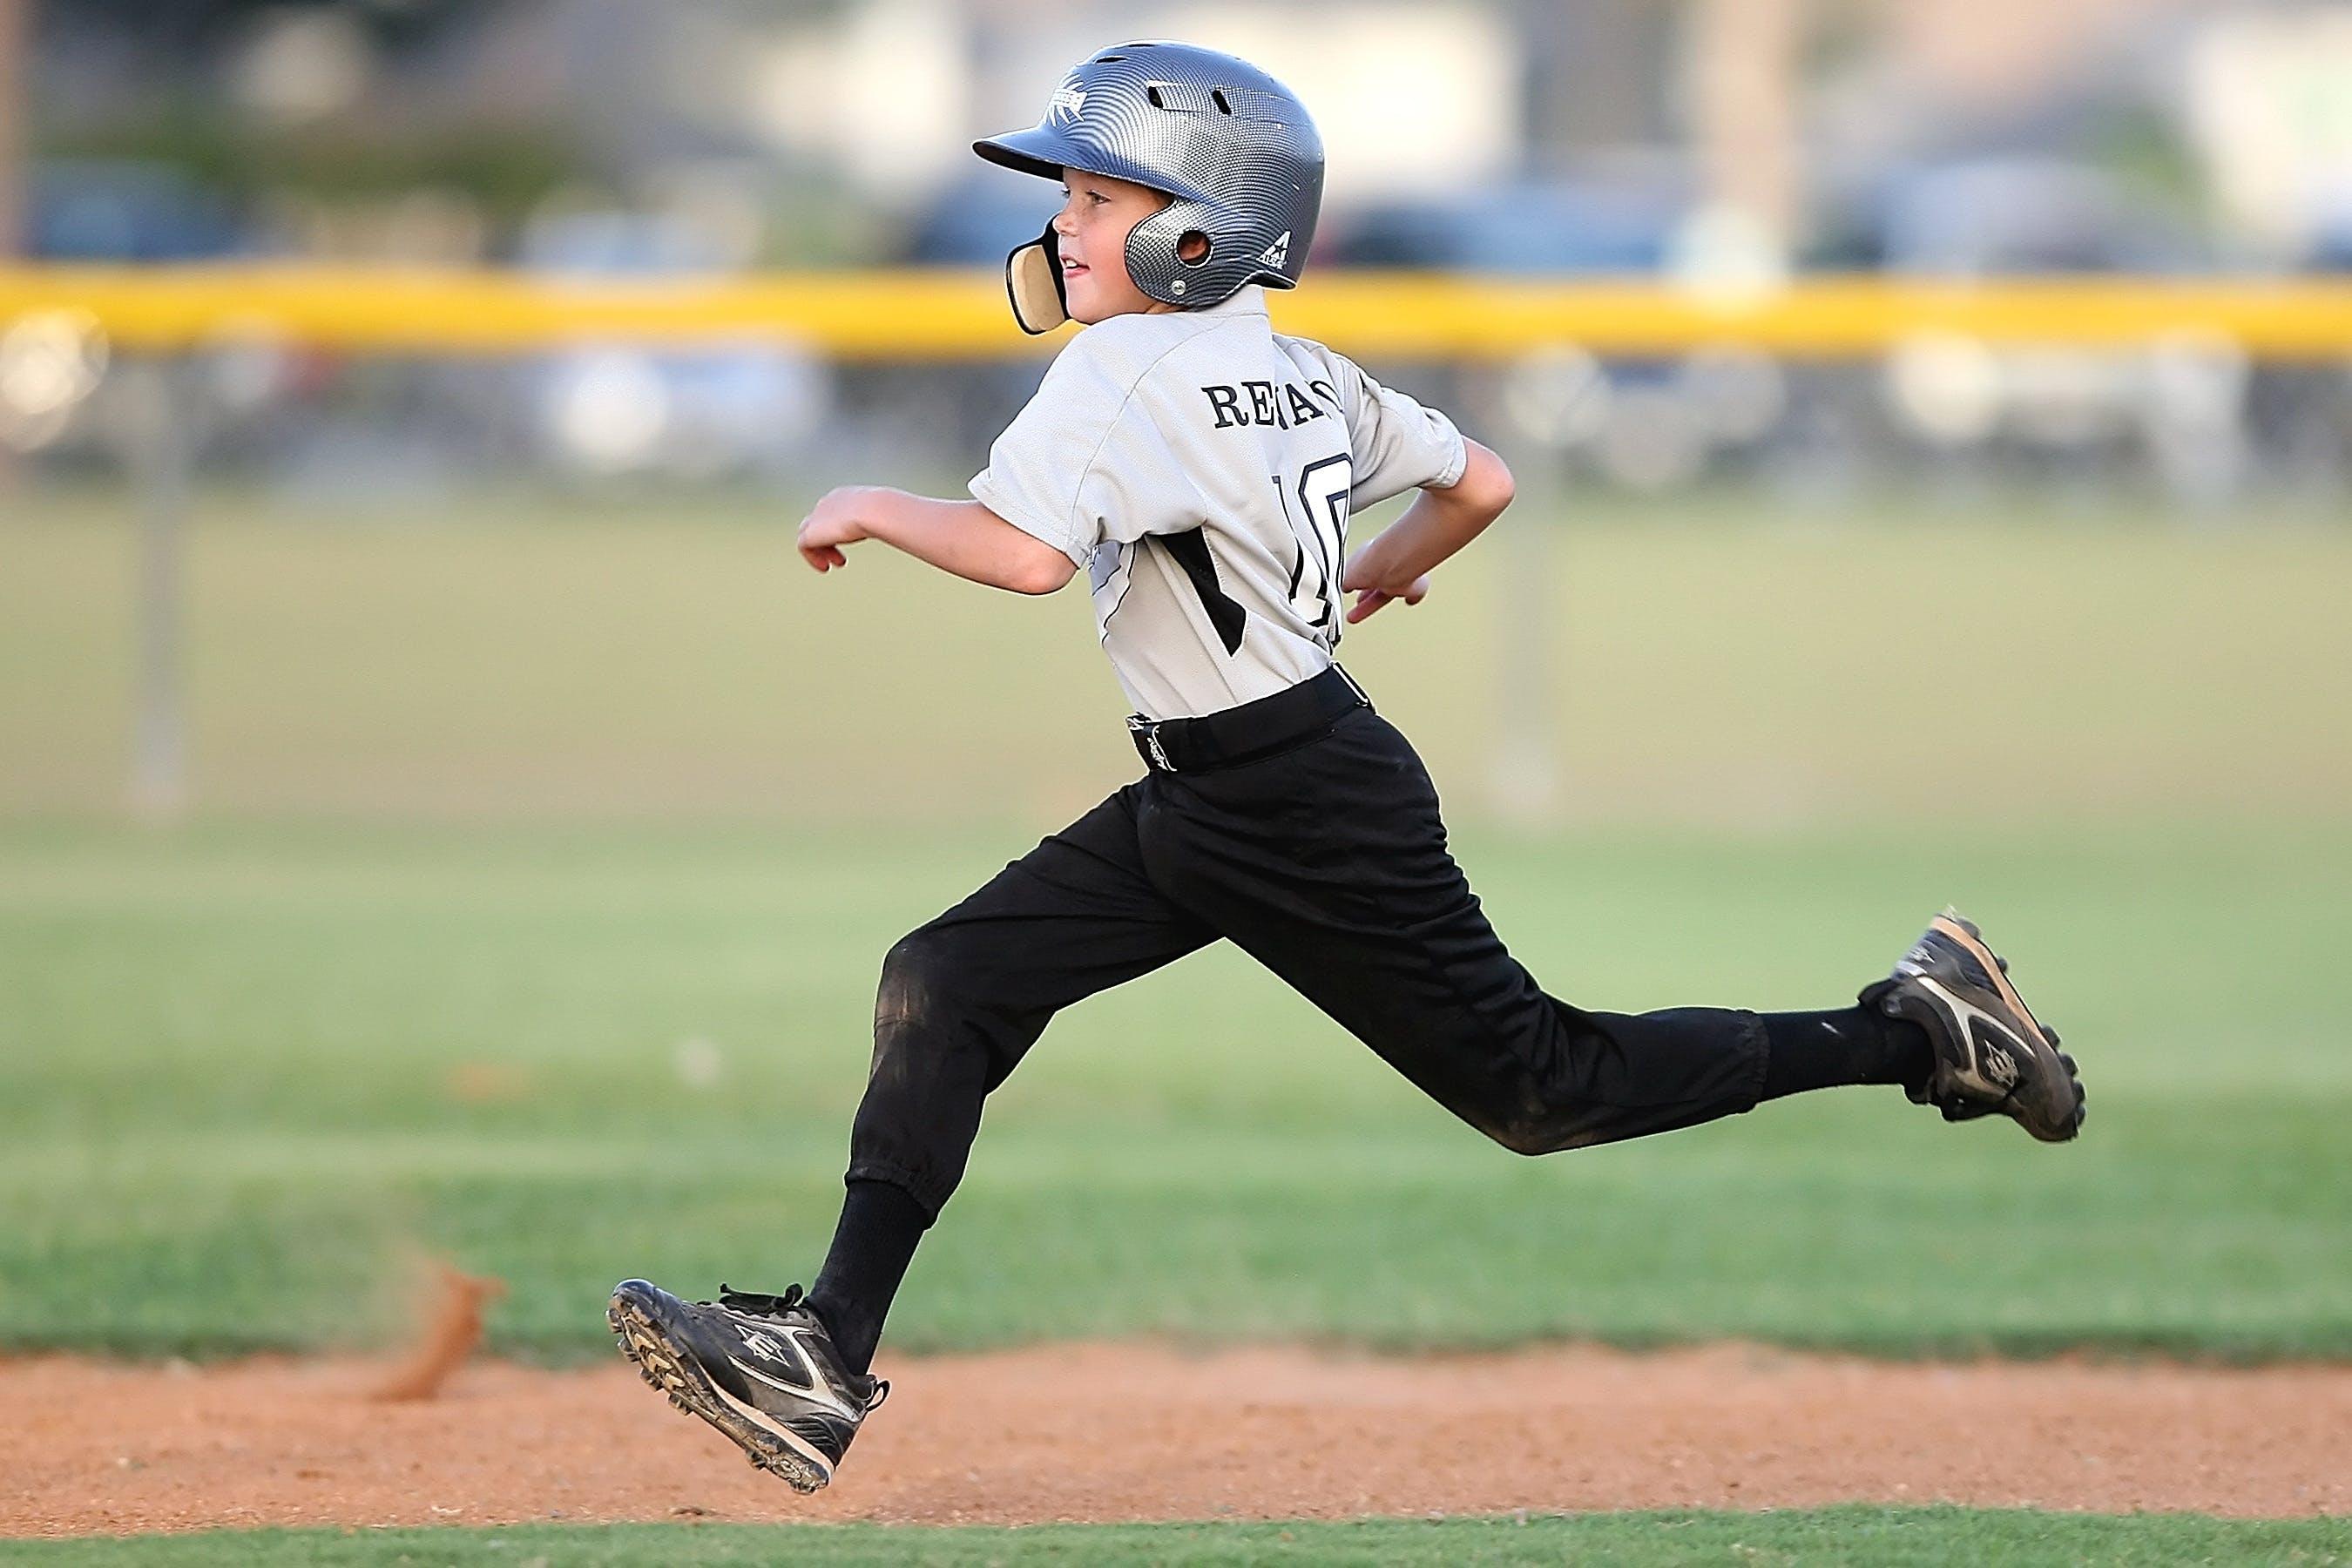 Kostenloses Stock Foto zu action, aktivität, athlet, baseball